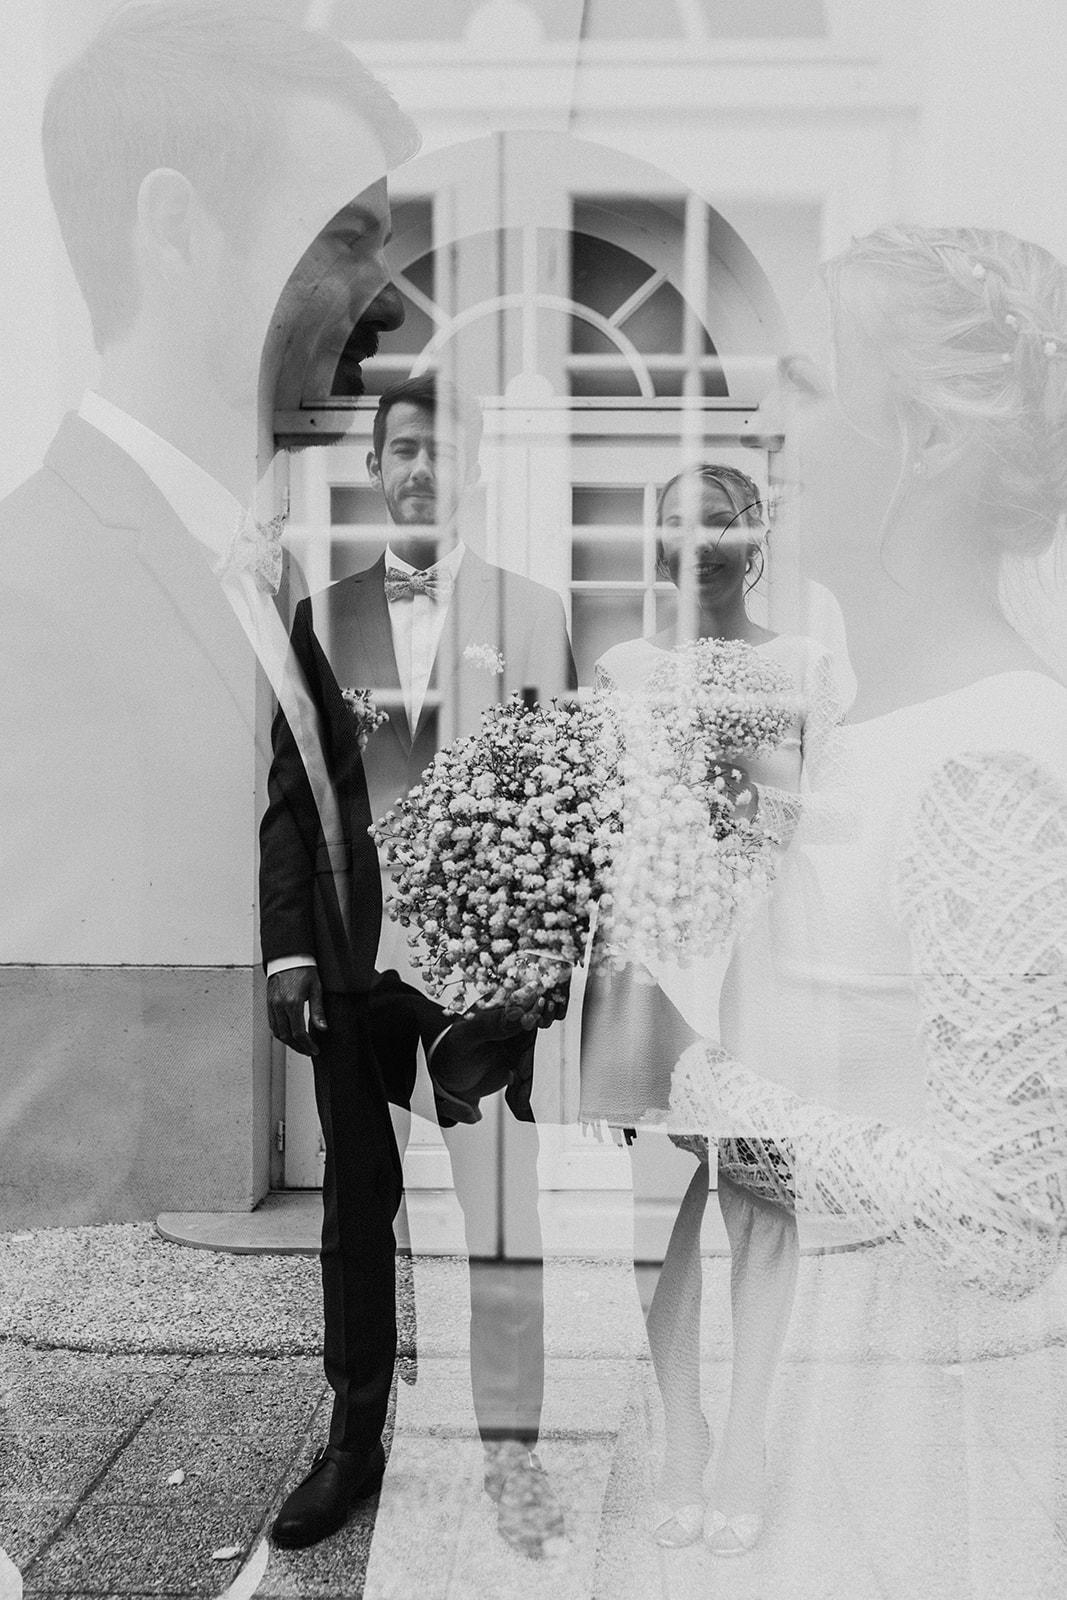 UTOPICLOVERS20200627 – Mariage Civil Manon Florian  5237 - Le mariage civil de Manon et Florian dans les Yvelines.